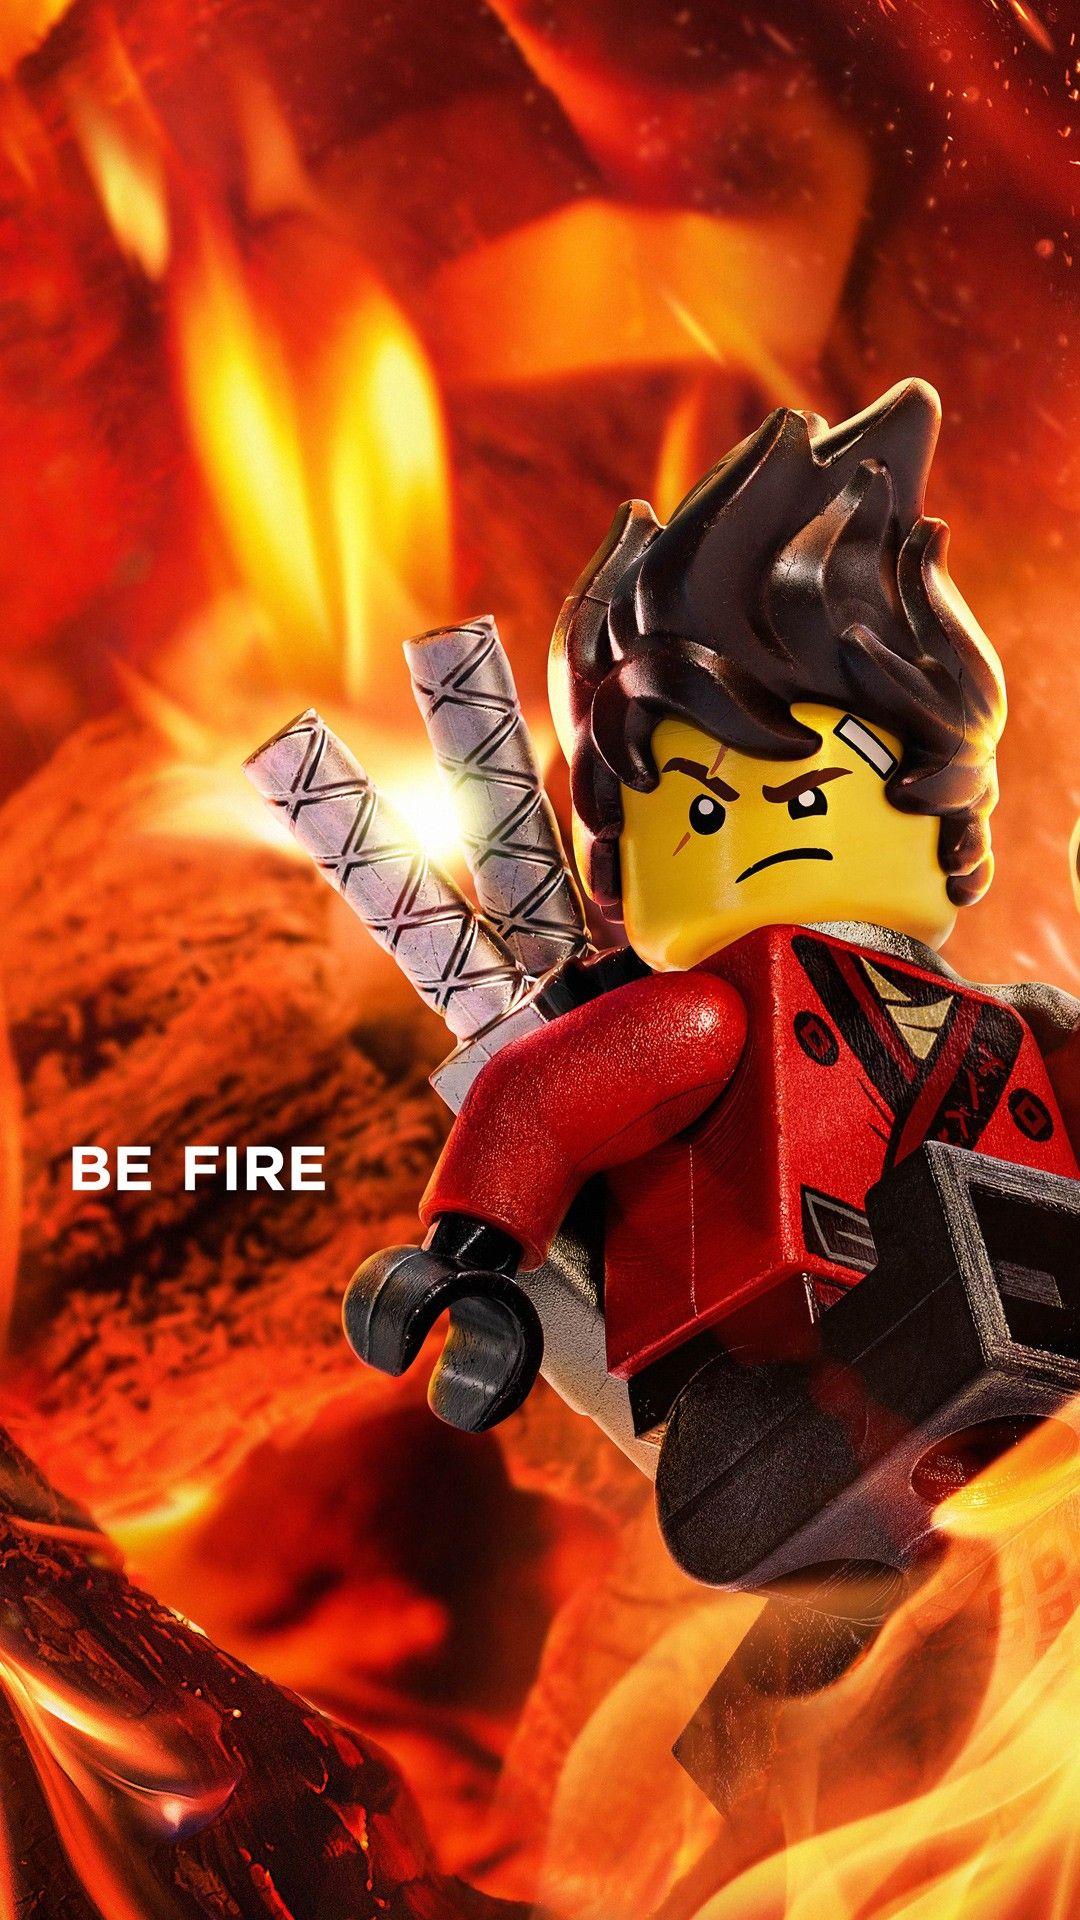 The Lego Batman Movie Wallpaper 4k Lego Ninjago Movie Poster 860992 Hd Wallpaper Backgrounds Download